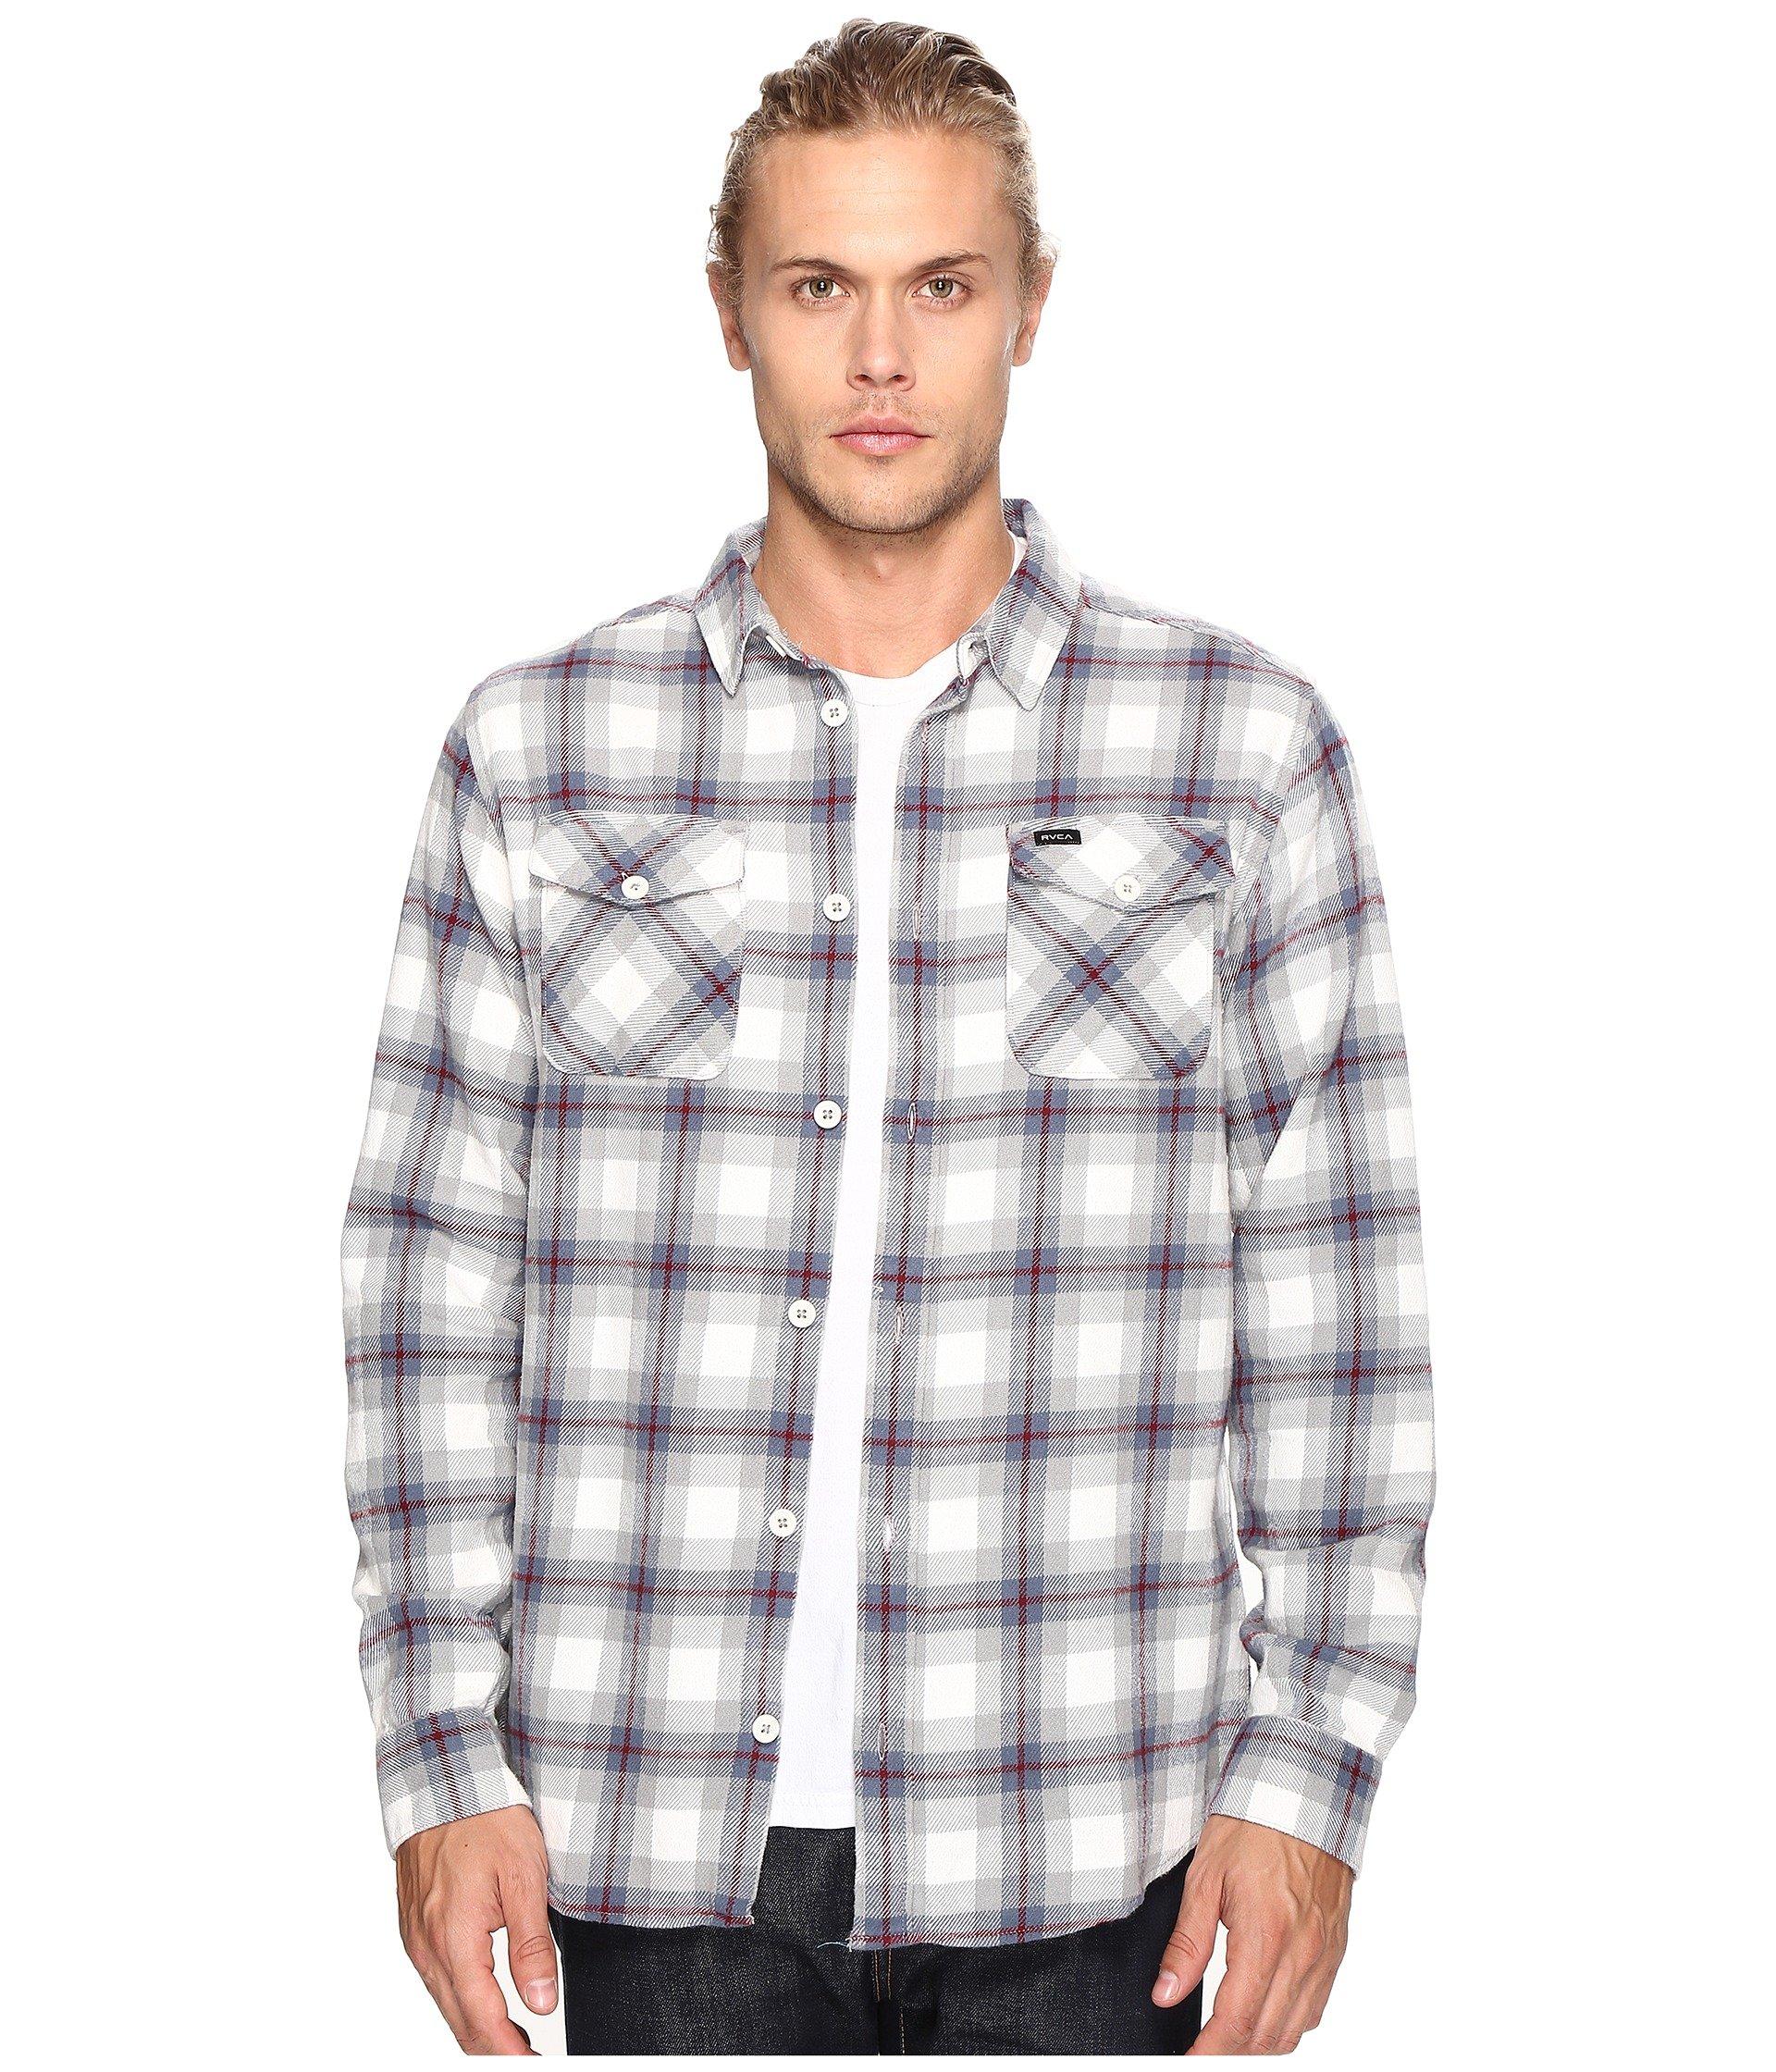 RVCA Men's Thatll Work Long Sleeve Flannel Shirt